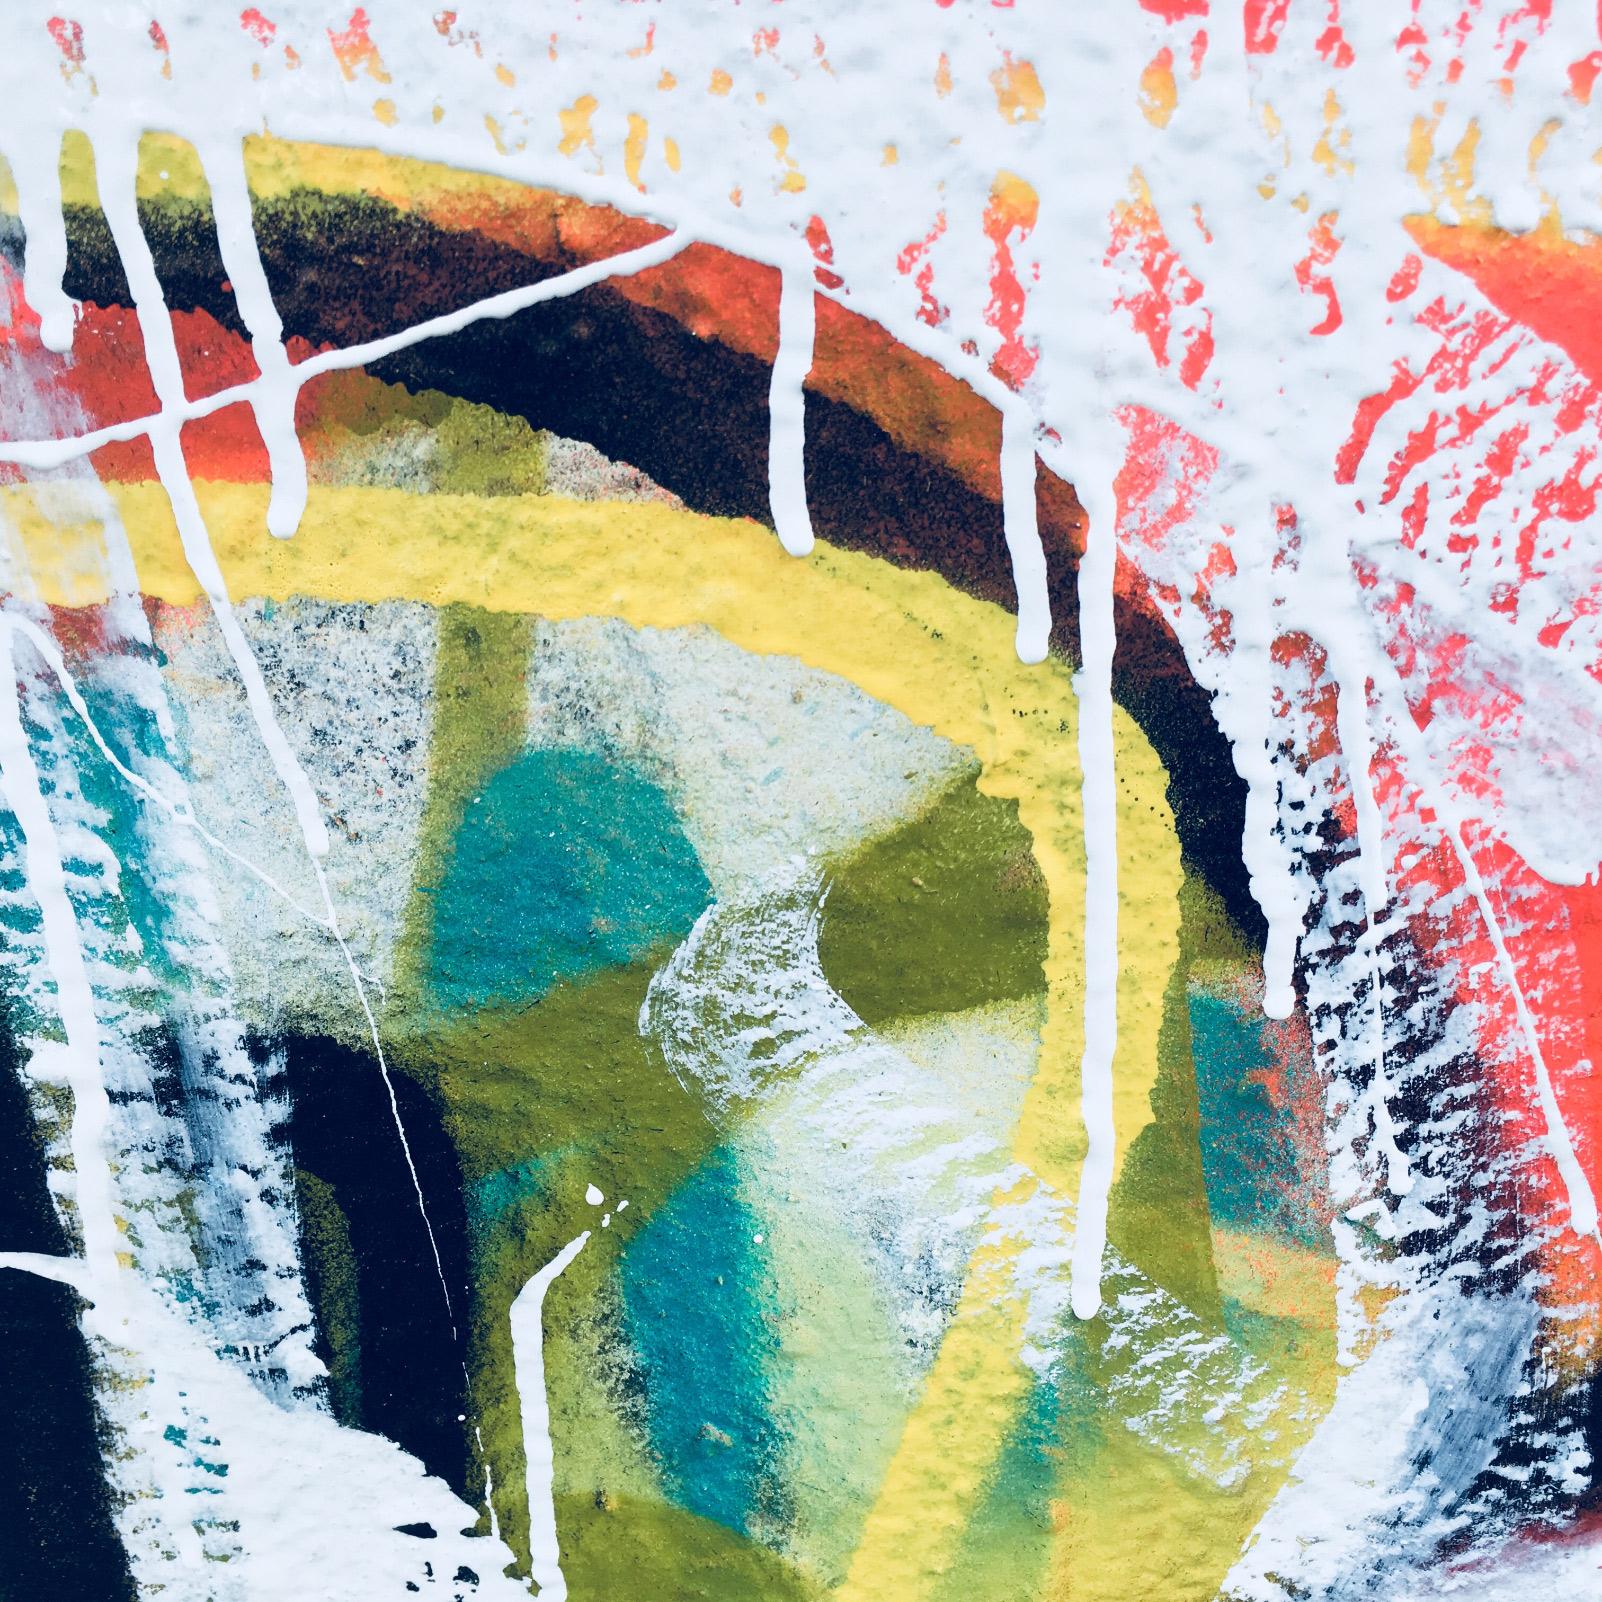 Rob_Adalierd_Painting_Vienna_Abstract_Contemporary_Street_art_6.jpg